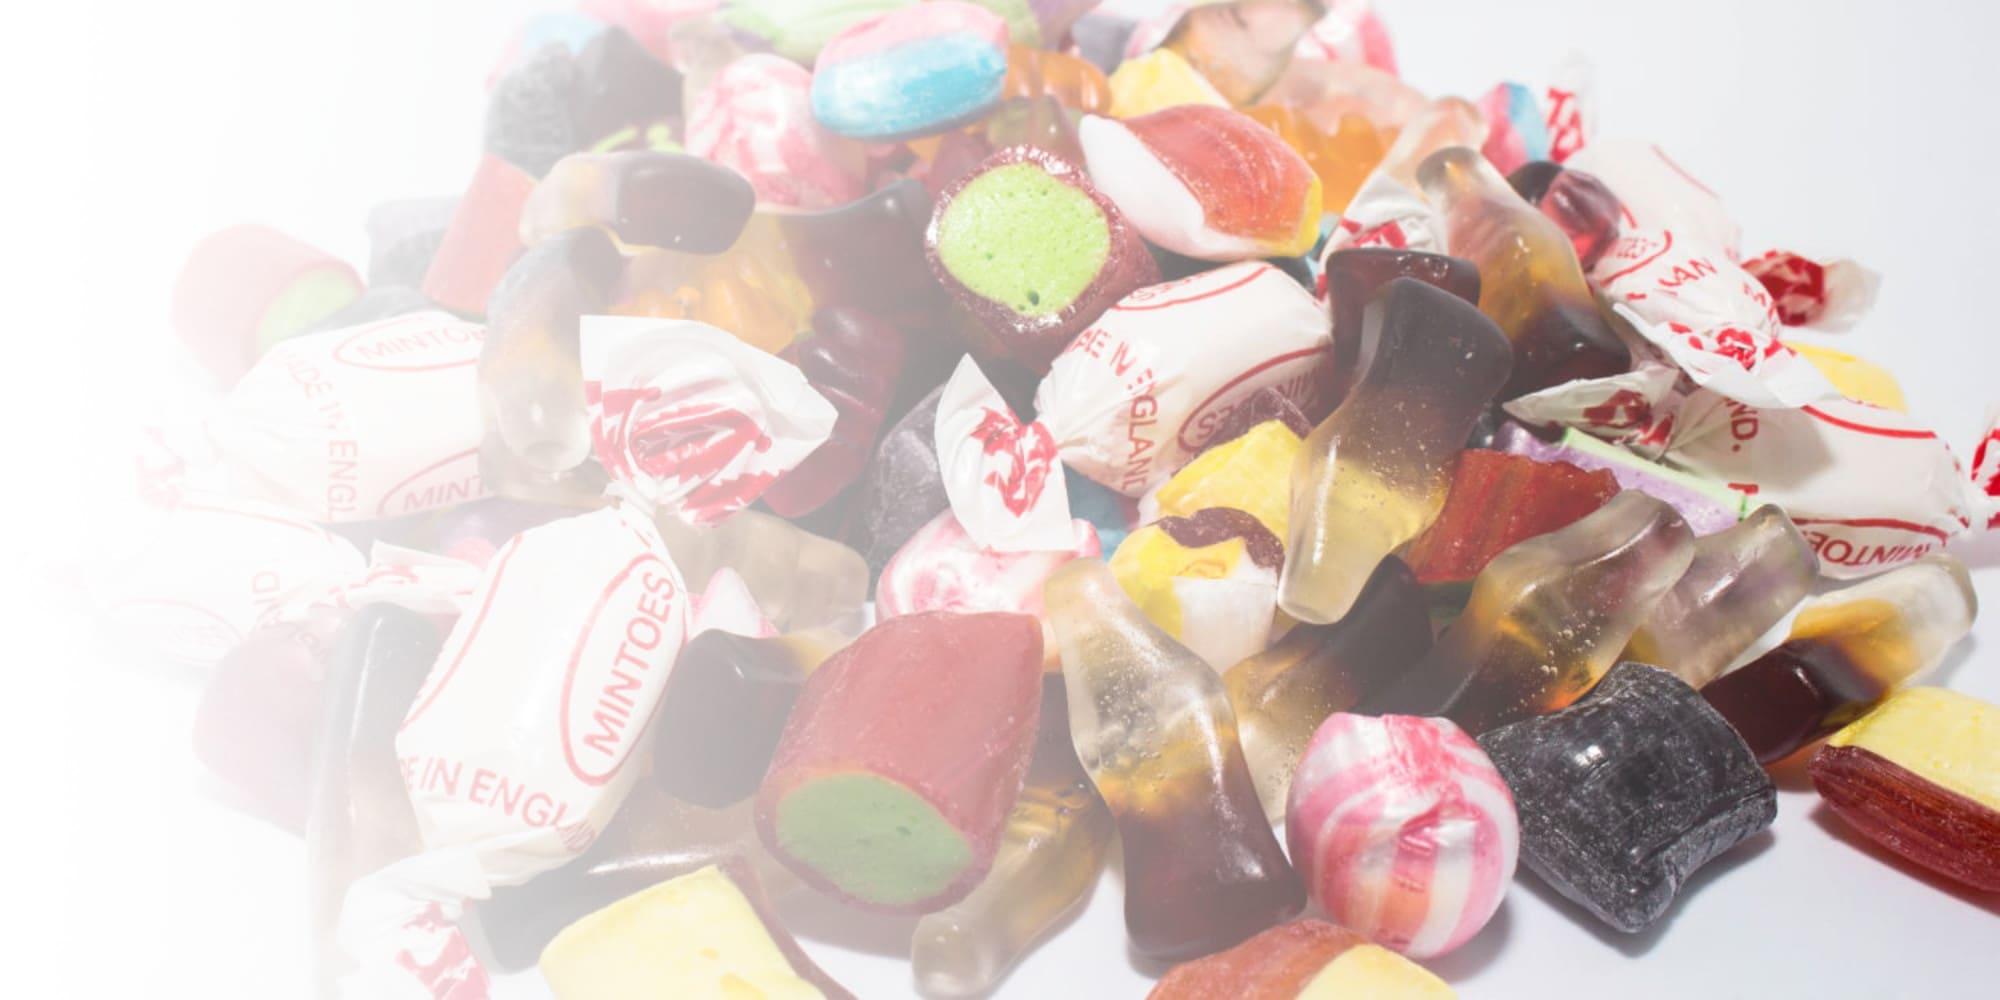 Marvelous Allmark Sweets Online Traditional Sweet Shop Wholesale Home Interior And Landscaping Mentranervesignezvosmurscom